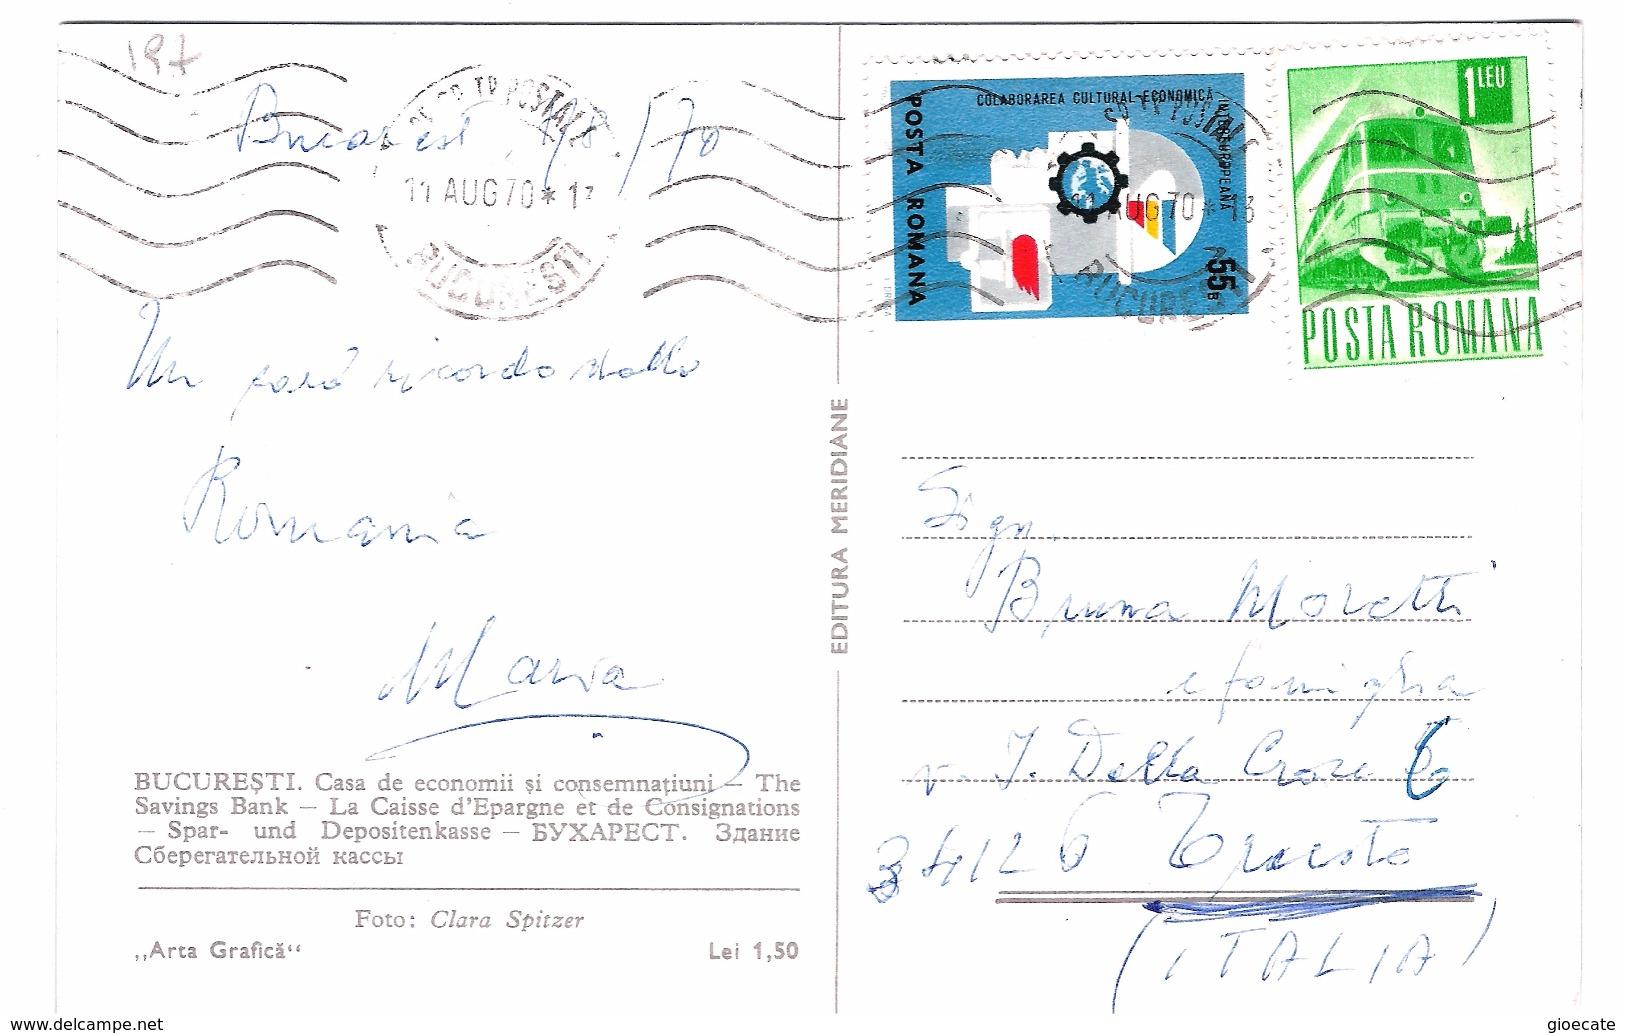 BUCHAREST - The Savings Bank Palace - VIAGGIATA 1970 - (197) - Romania